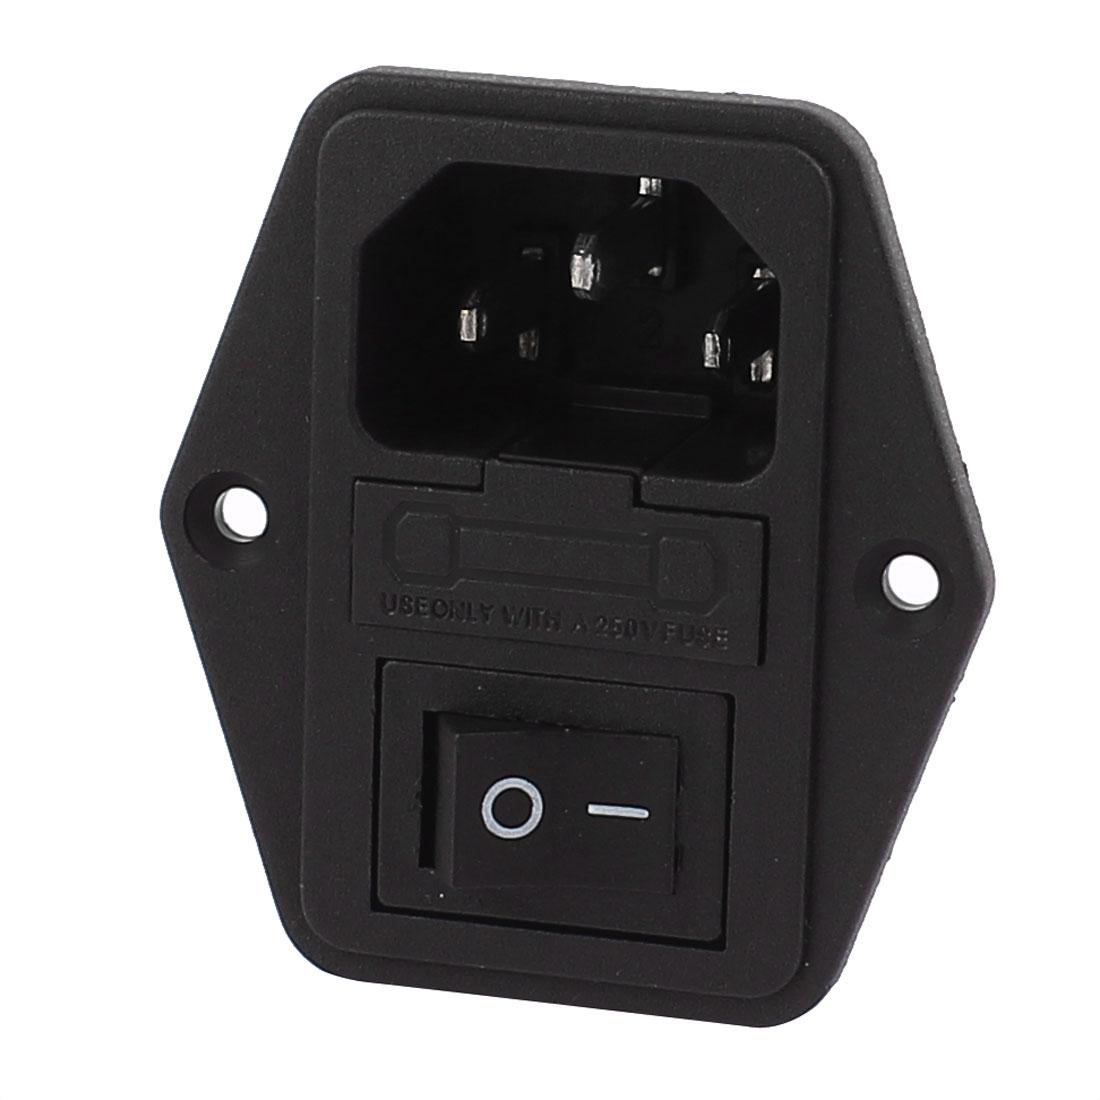 AC 250V 10A 2P Black Rocker Switch Fuse Holder Inlet Power Socket Screw Mount